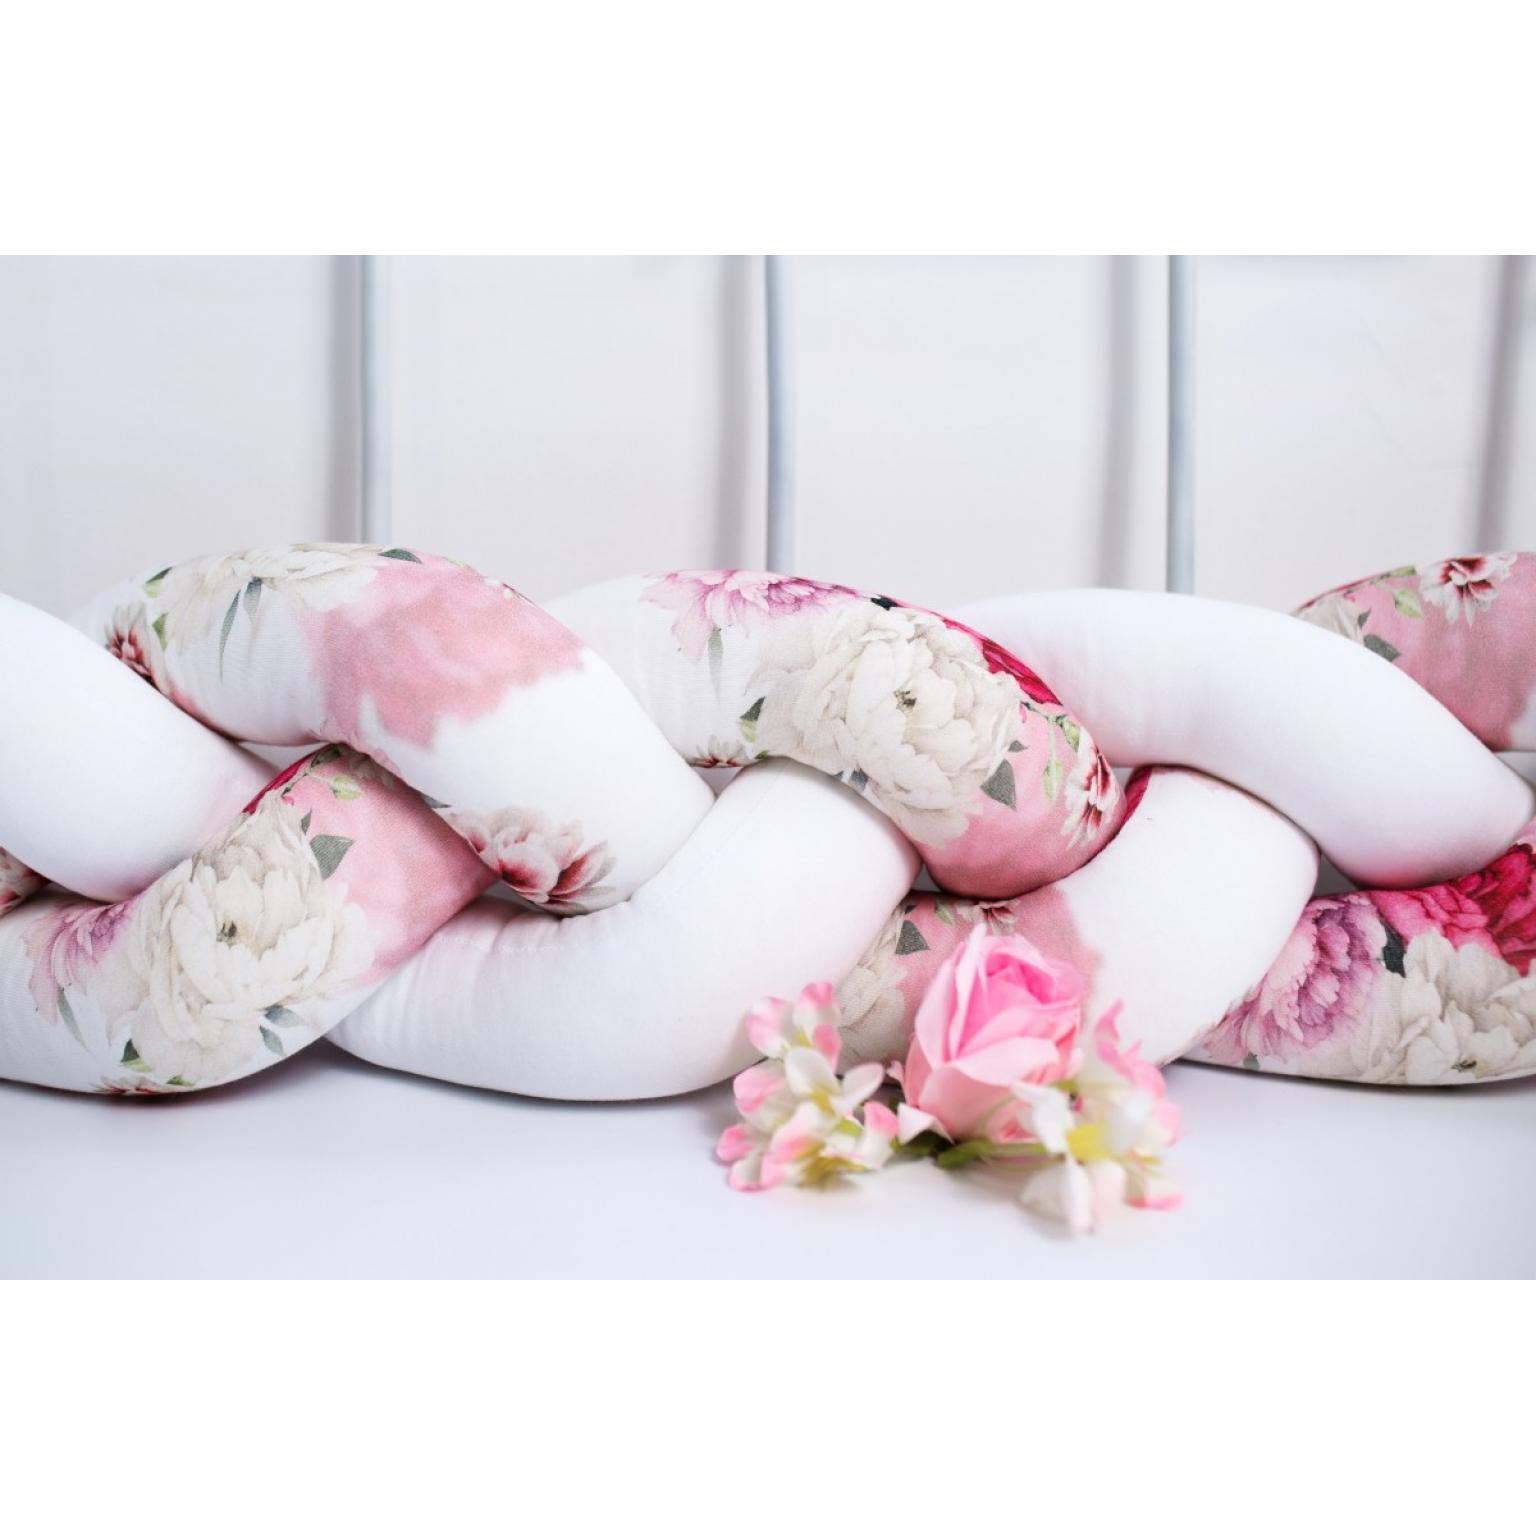 pīta-gultas-apmale-bizīte-3-flooforbaby-flowers